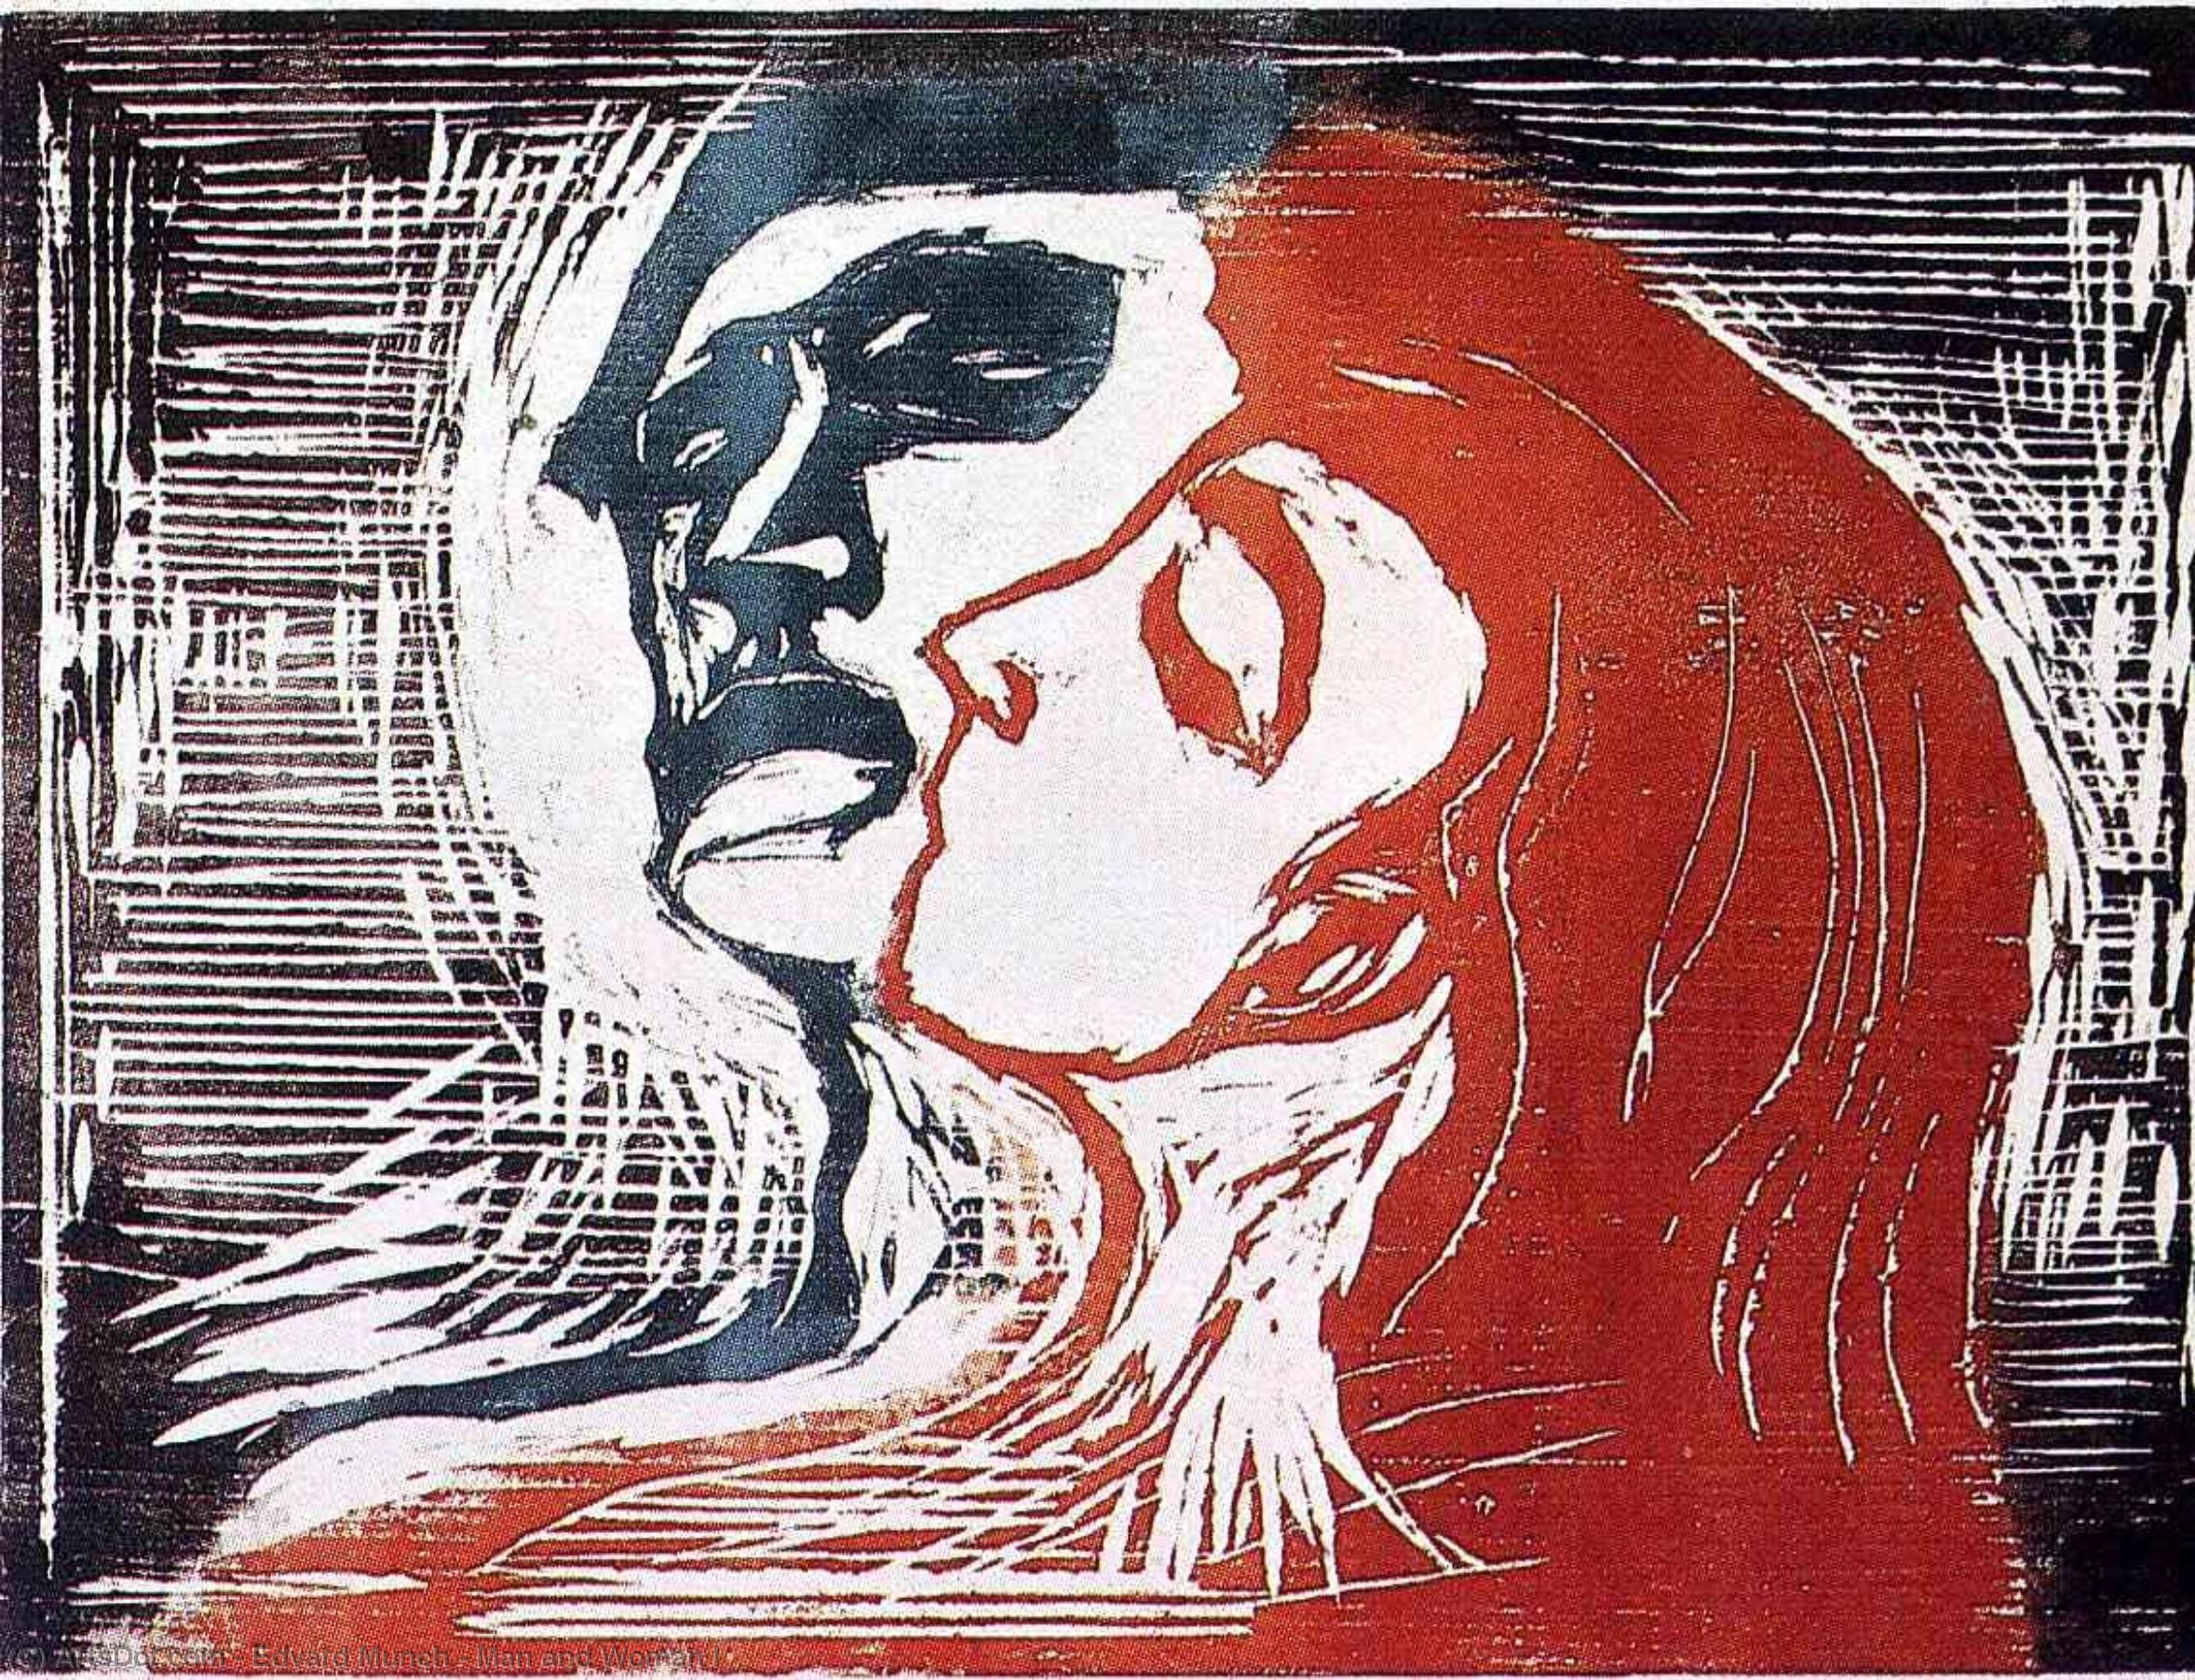 WikiOO.org - Encyclopedia of Fine Arts - Schilderen, Artwork Edvard Munch - Man and Woman I